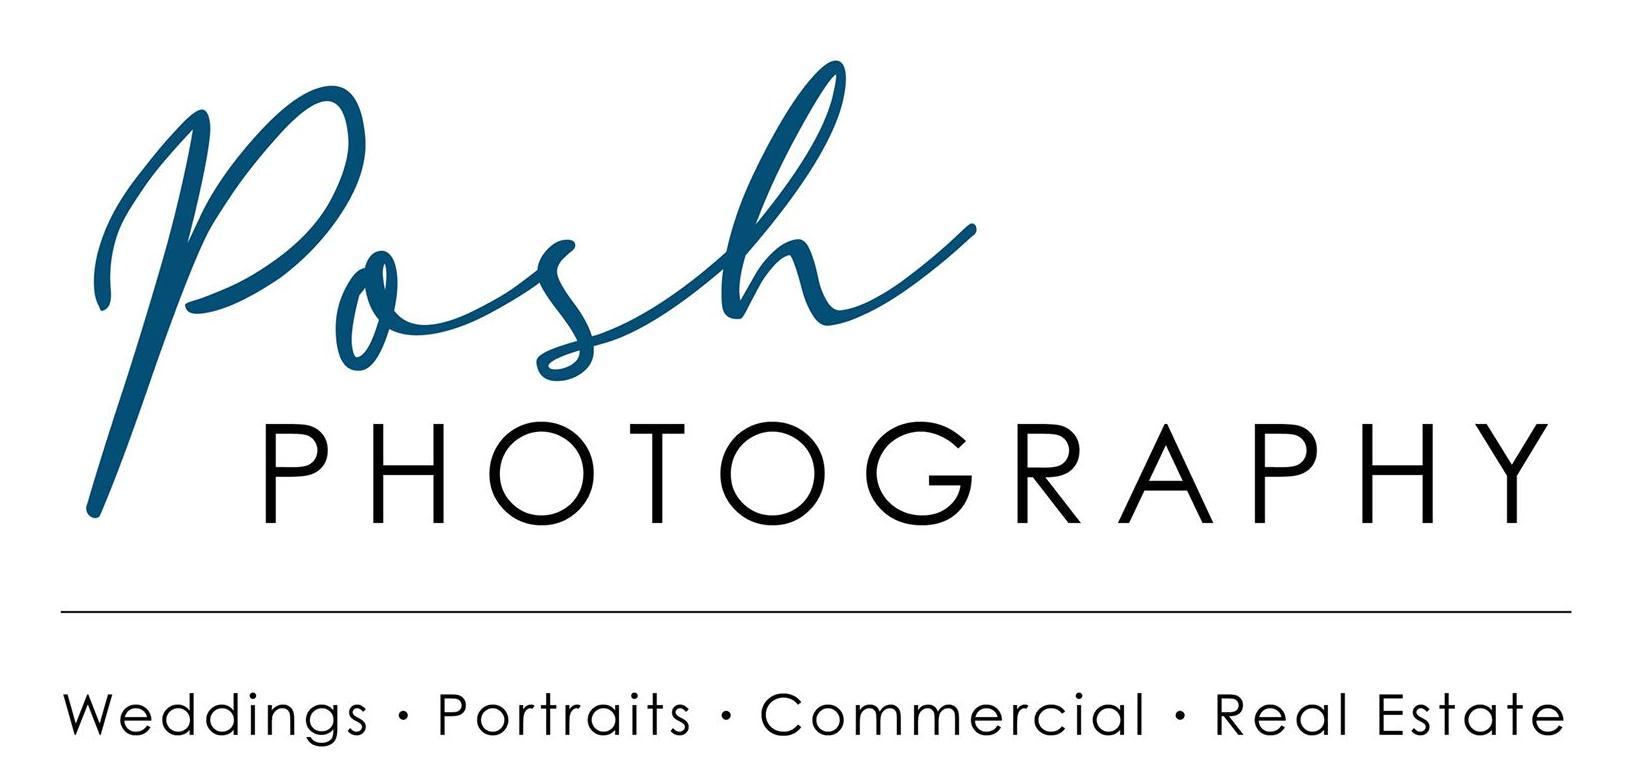 Posh Photography